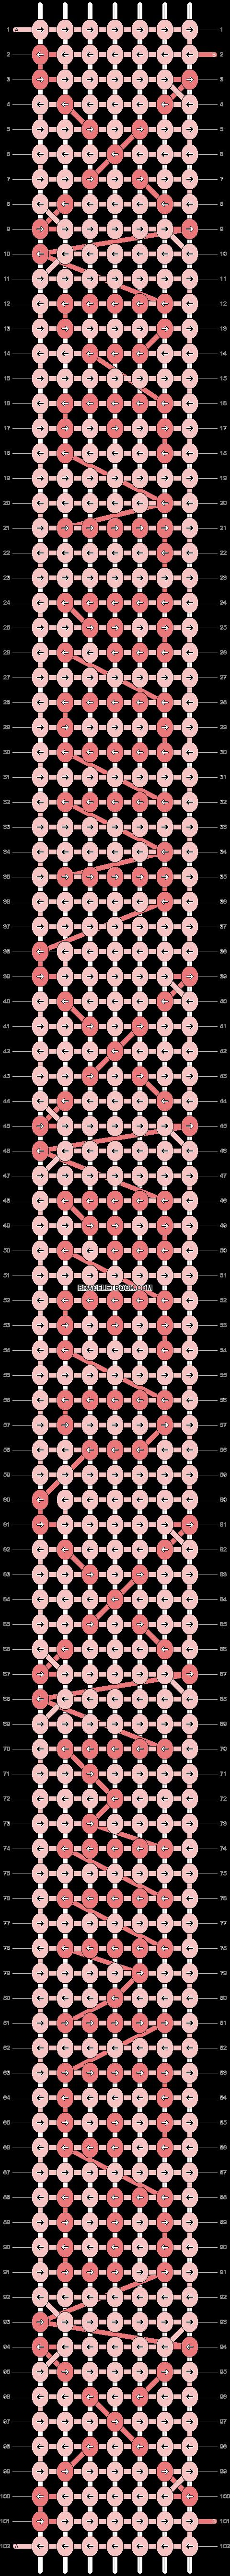 Alpha pattern #1536 pattern